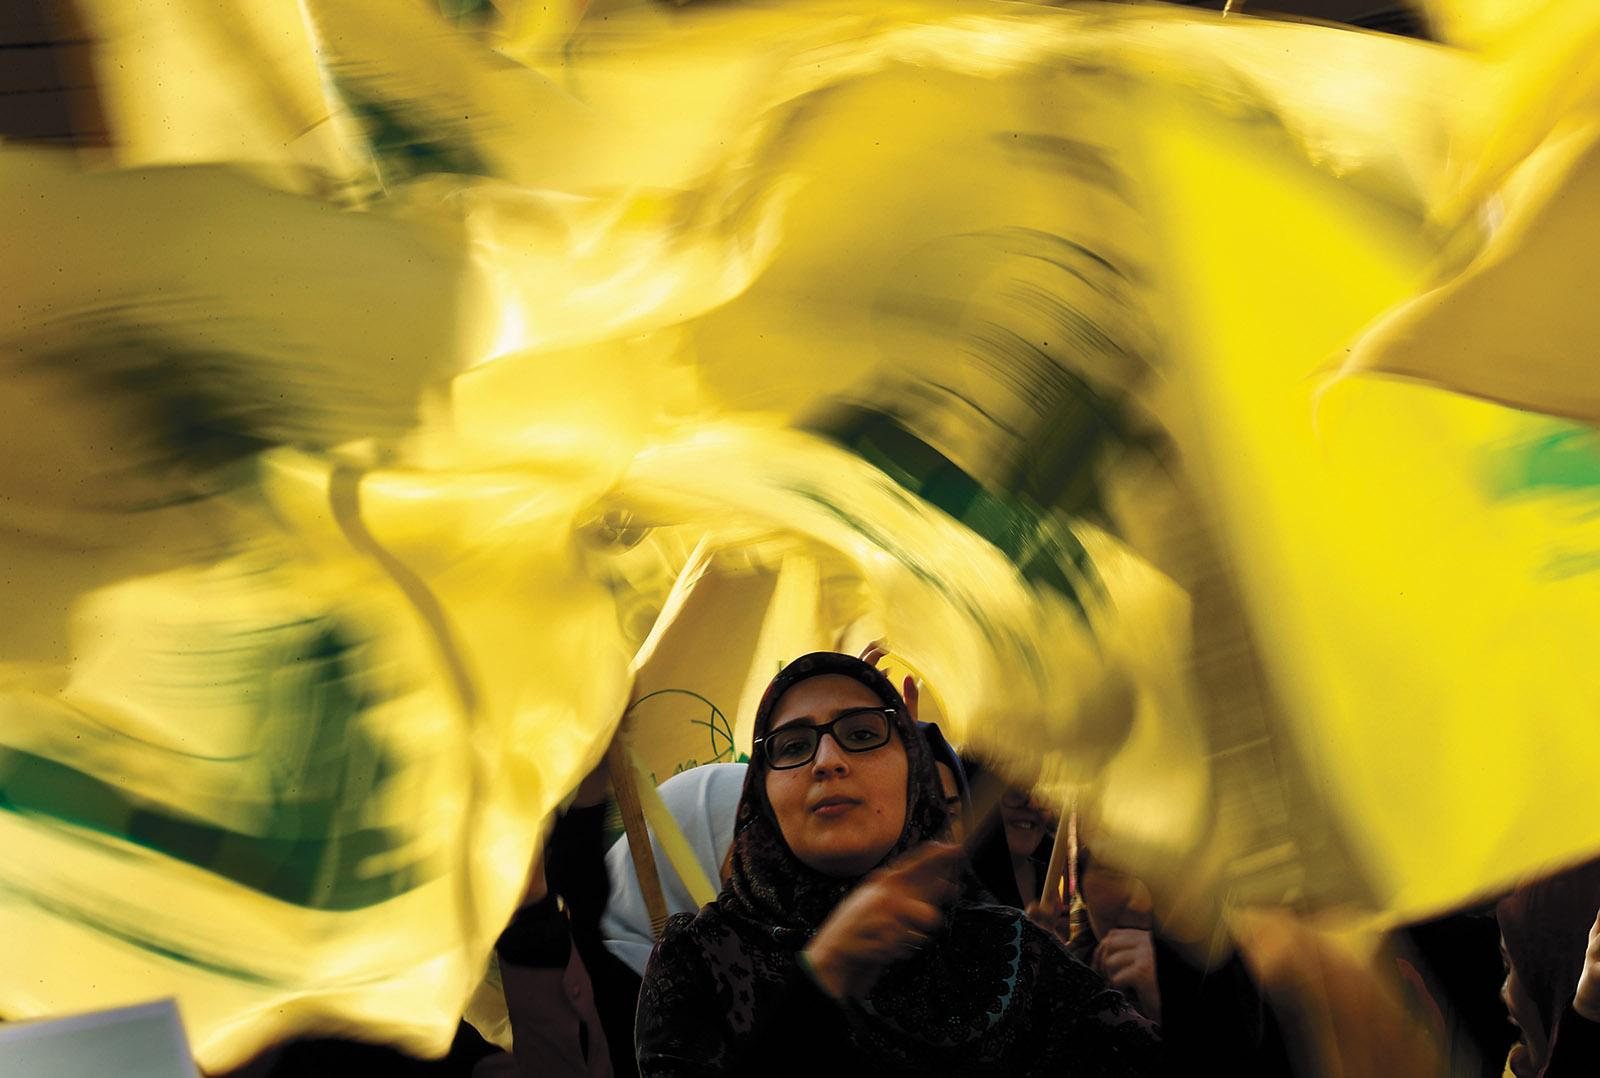 A Hezbollah supporter during a campaign speech by Hezbollah secretary-general Hassan Nasrallah near Beirut, Lebanon, April 2018